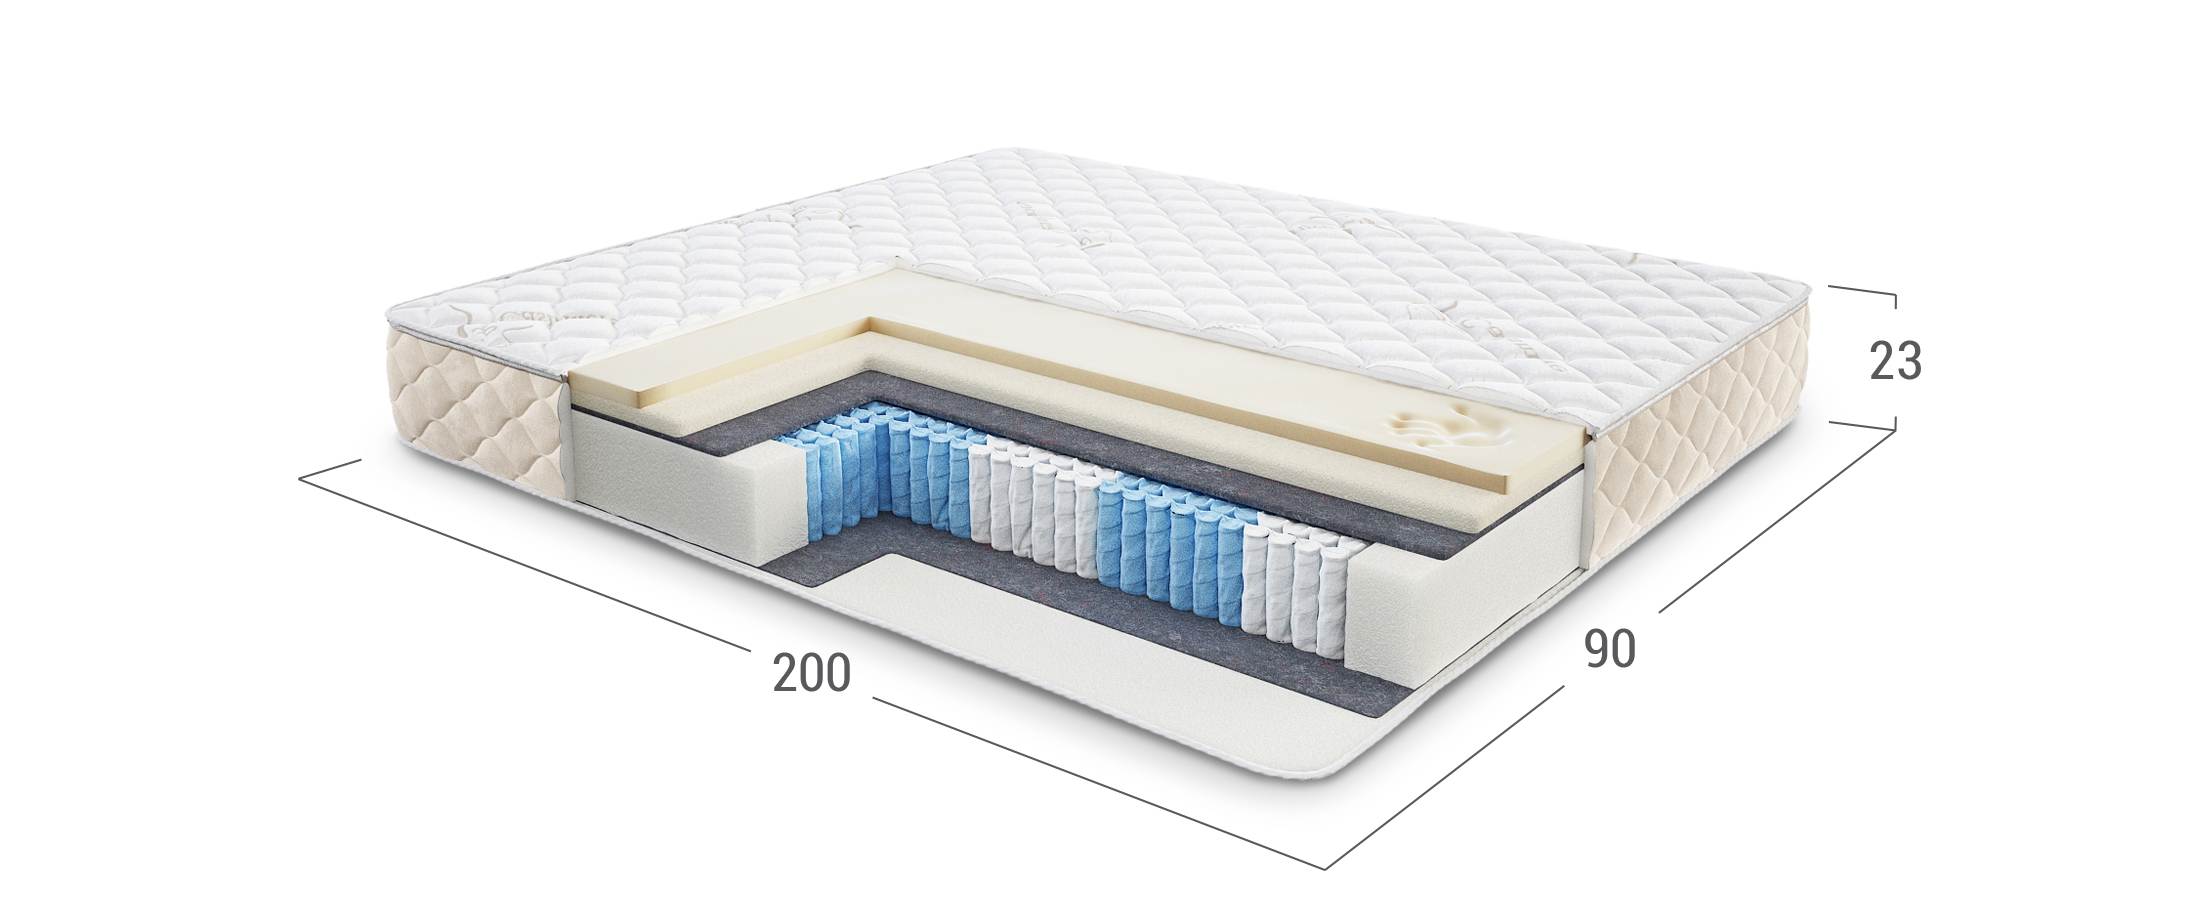 Comfort Plus Memory Soft 441 матрас 90x200 со съёмным чехлом